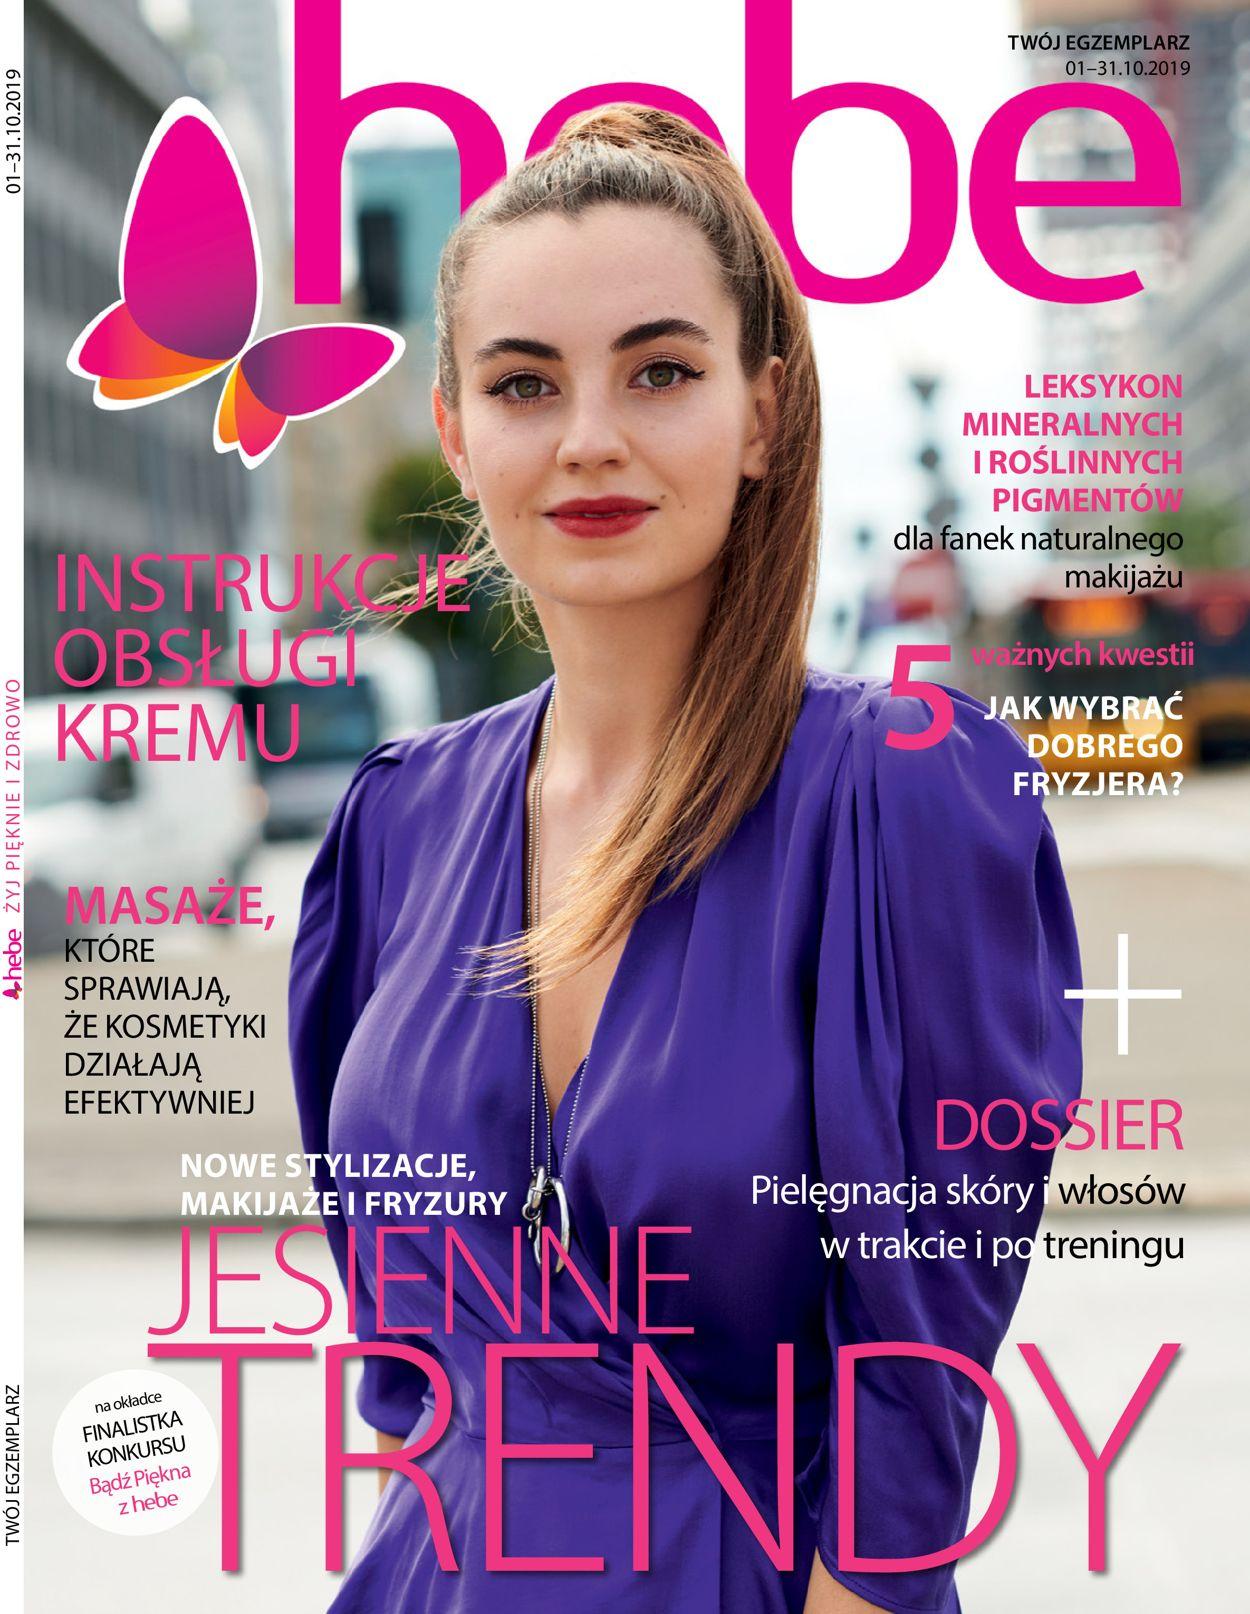 Gazetka promocyjna Hebe - 01.10-31.10.2019